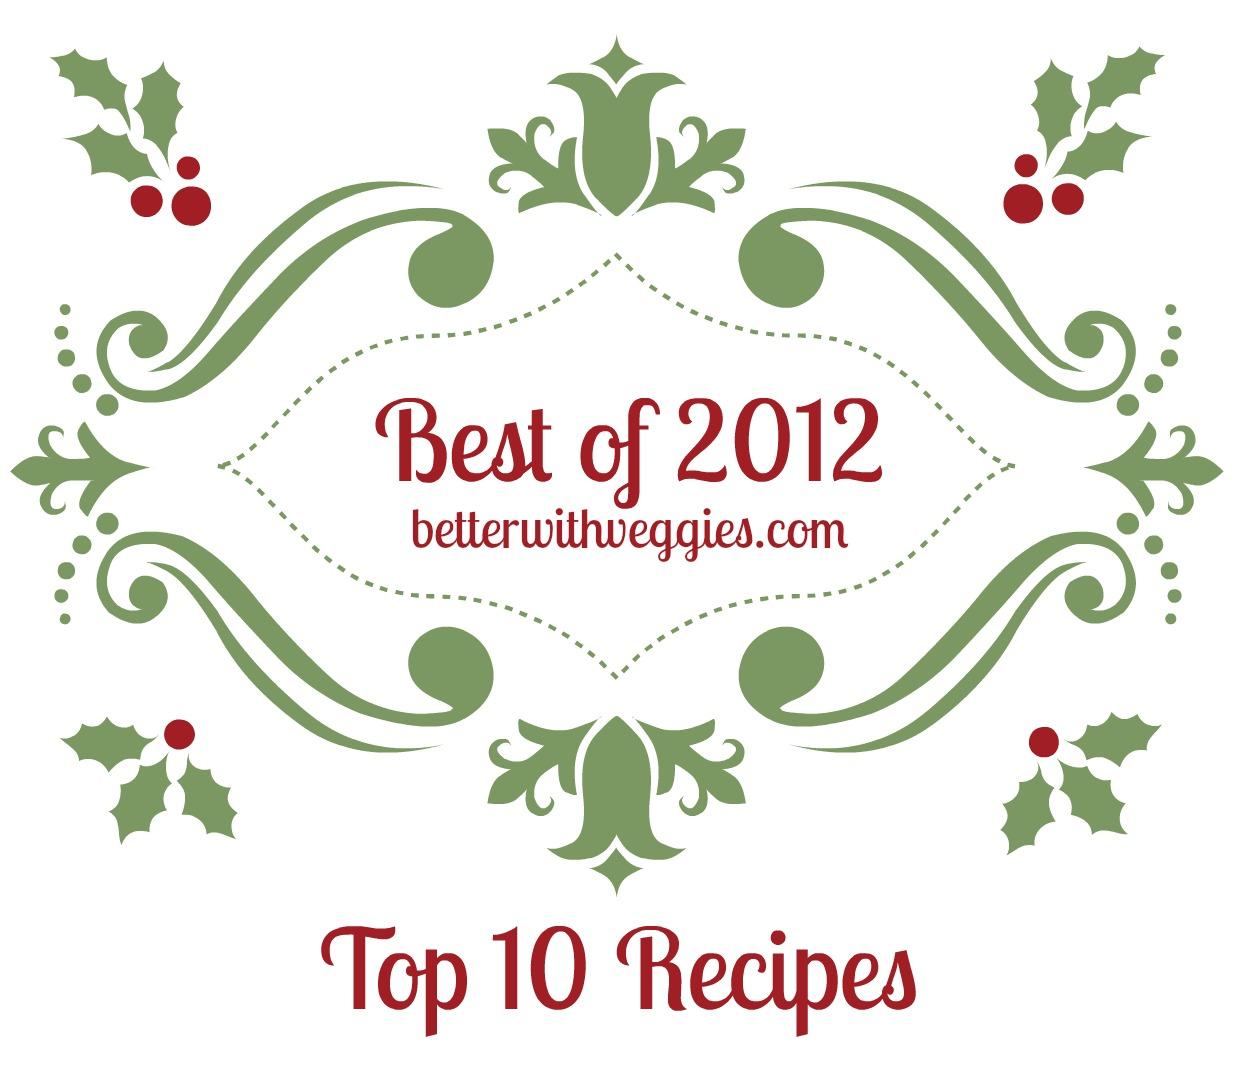 Bestof2012-Recipes